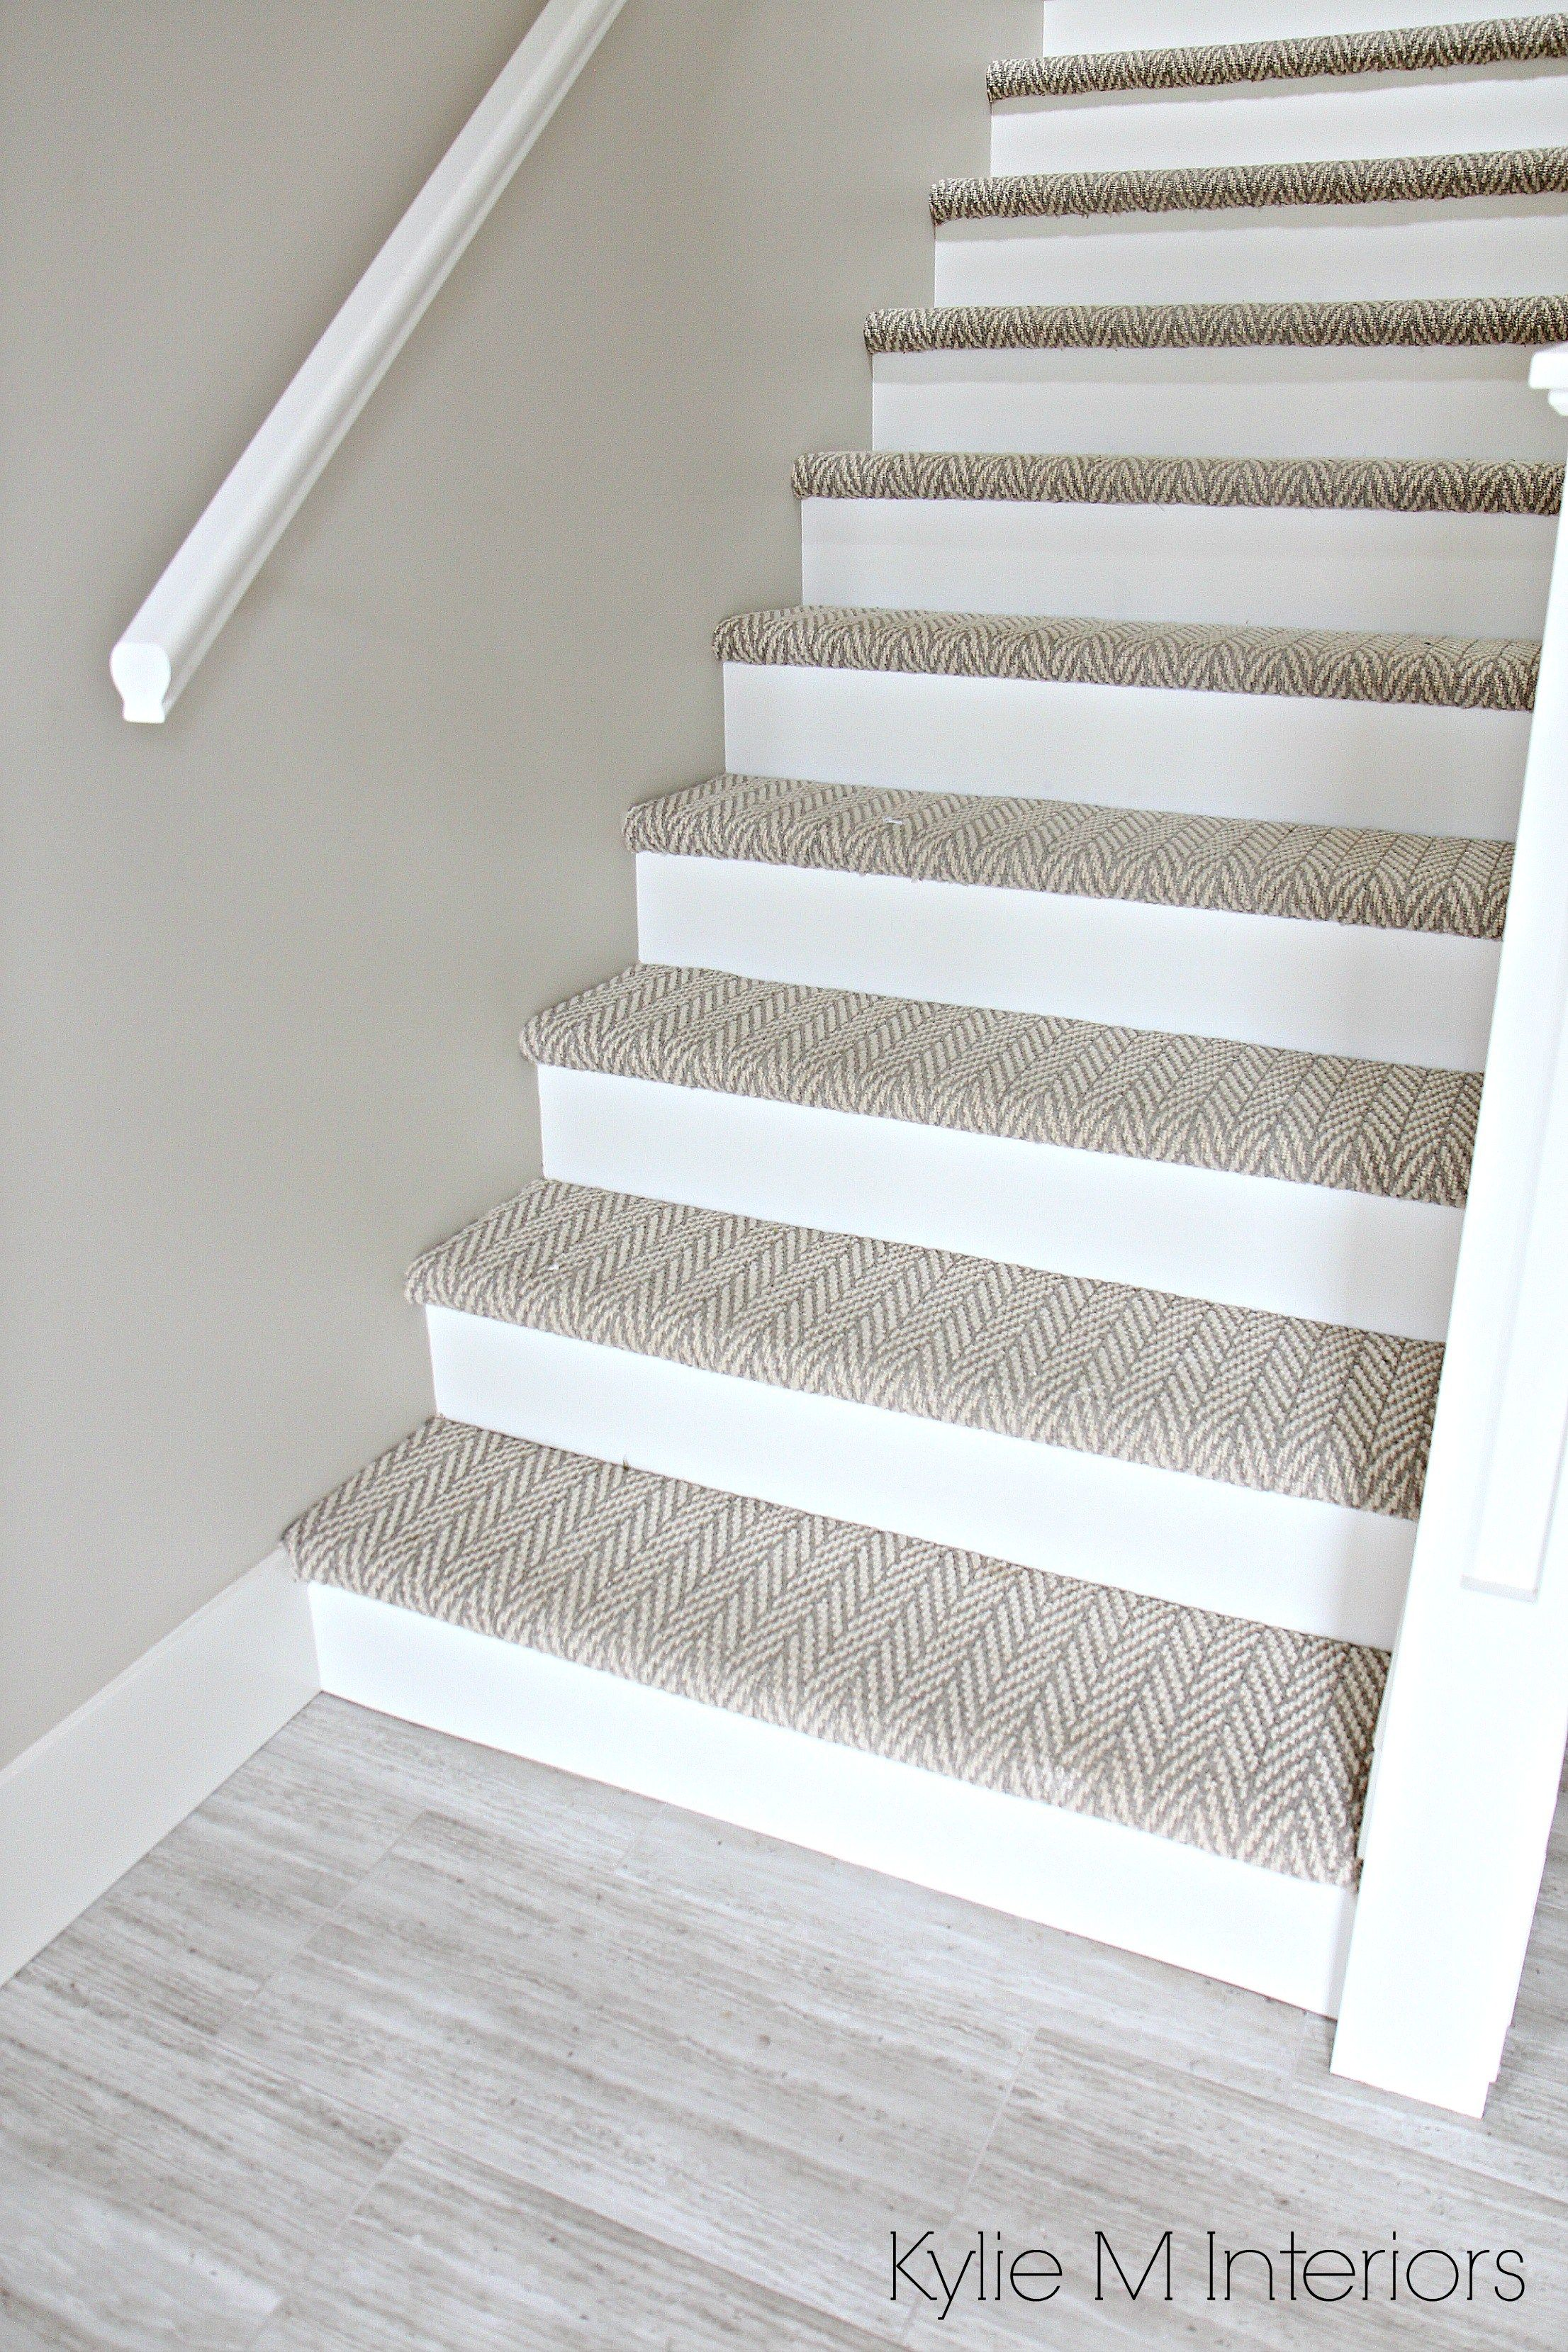 Stairs With Carpet Herringbone Treads And Painted White Risers | Painted Stairs With Carpet | Middle | Design | Diamond Pattern | Victorian | Laminate